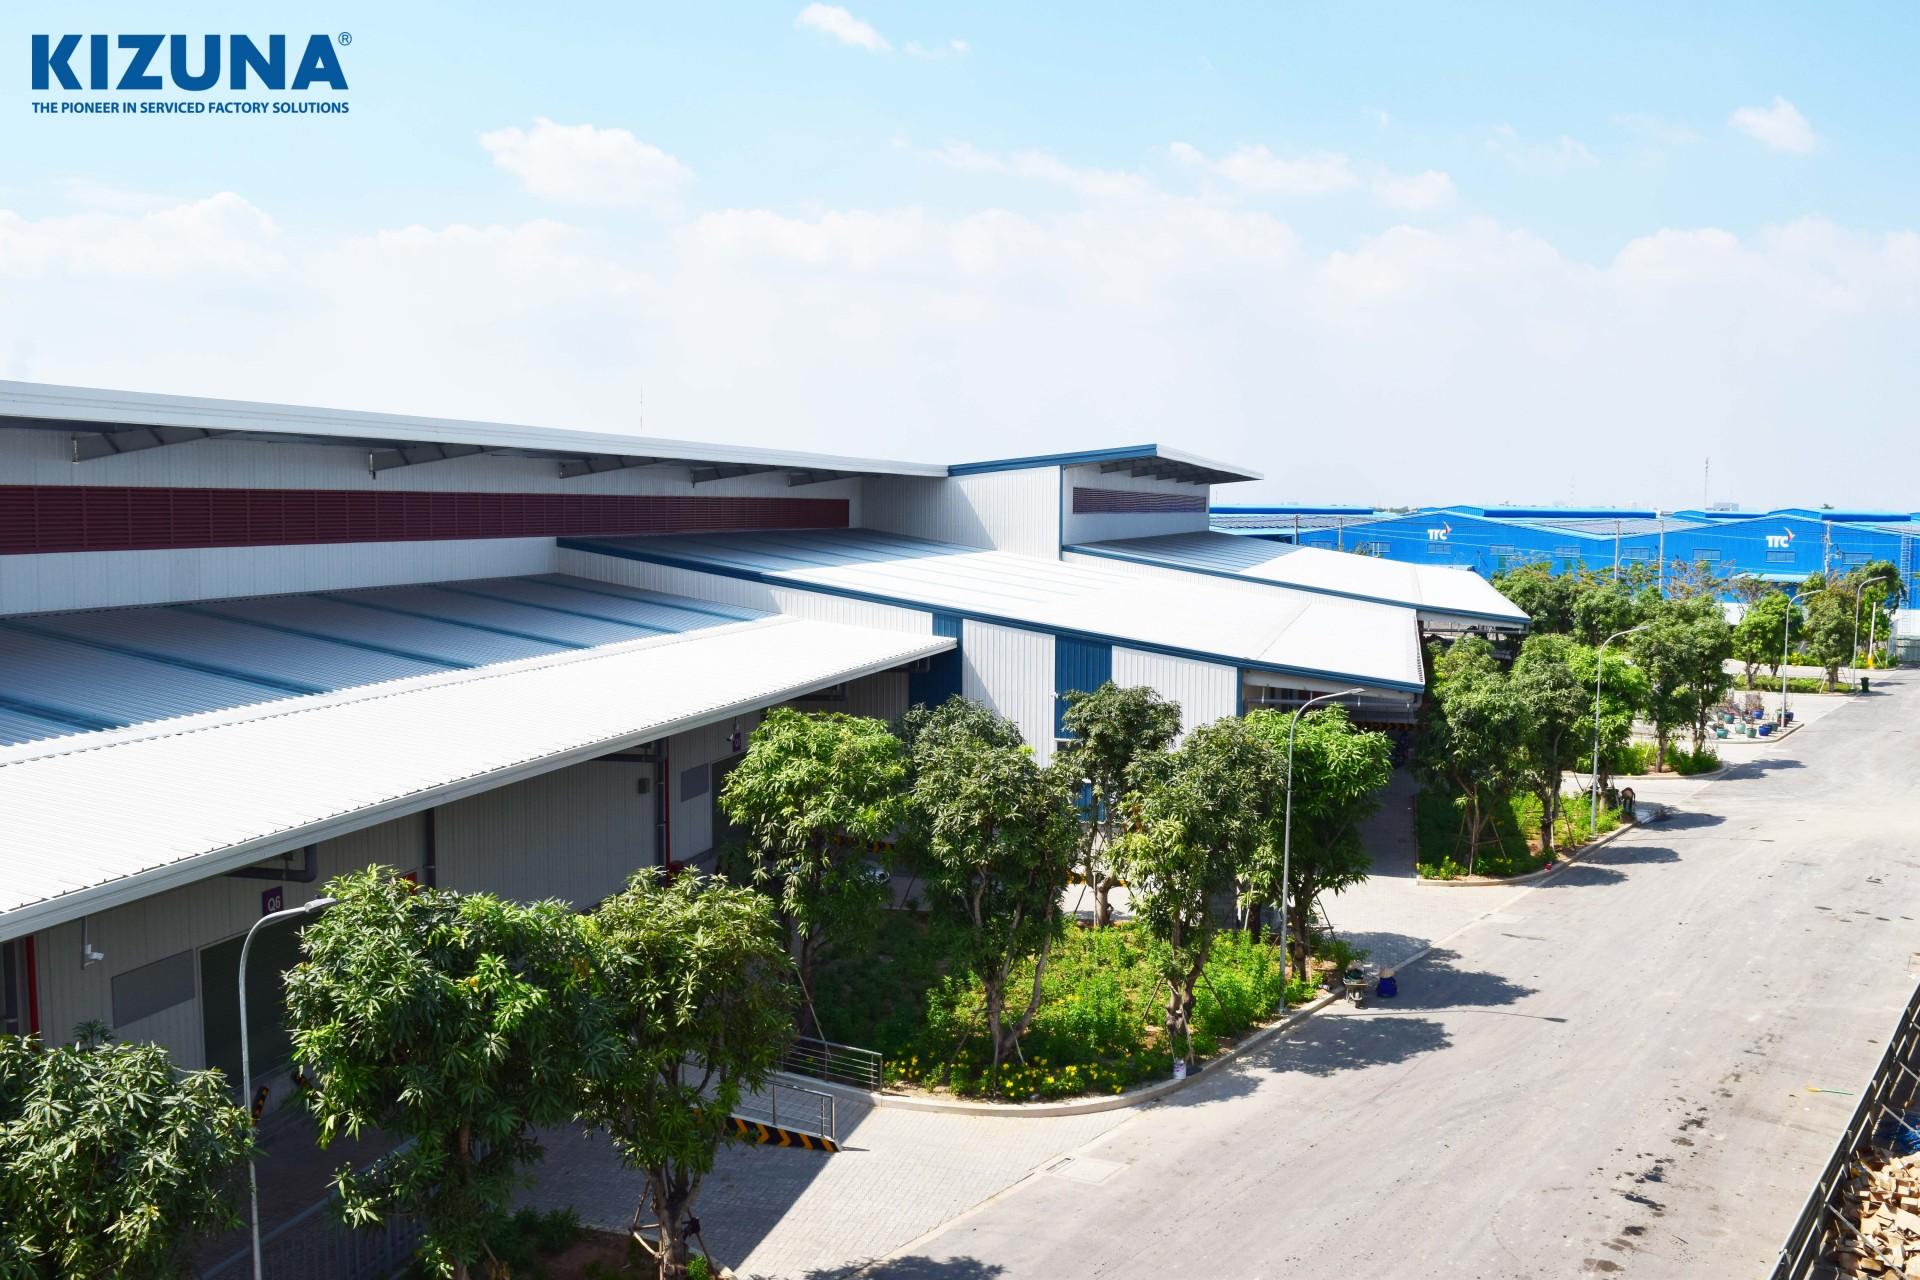 medical equipment factory kizuna